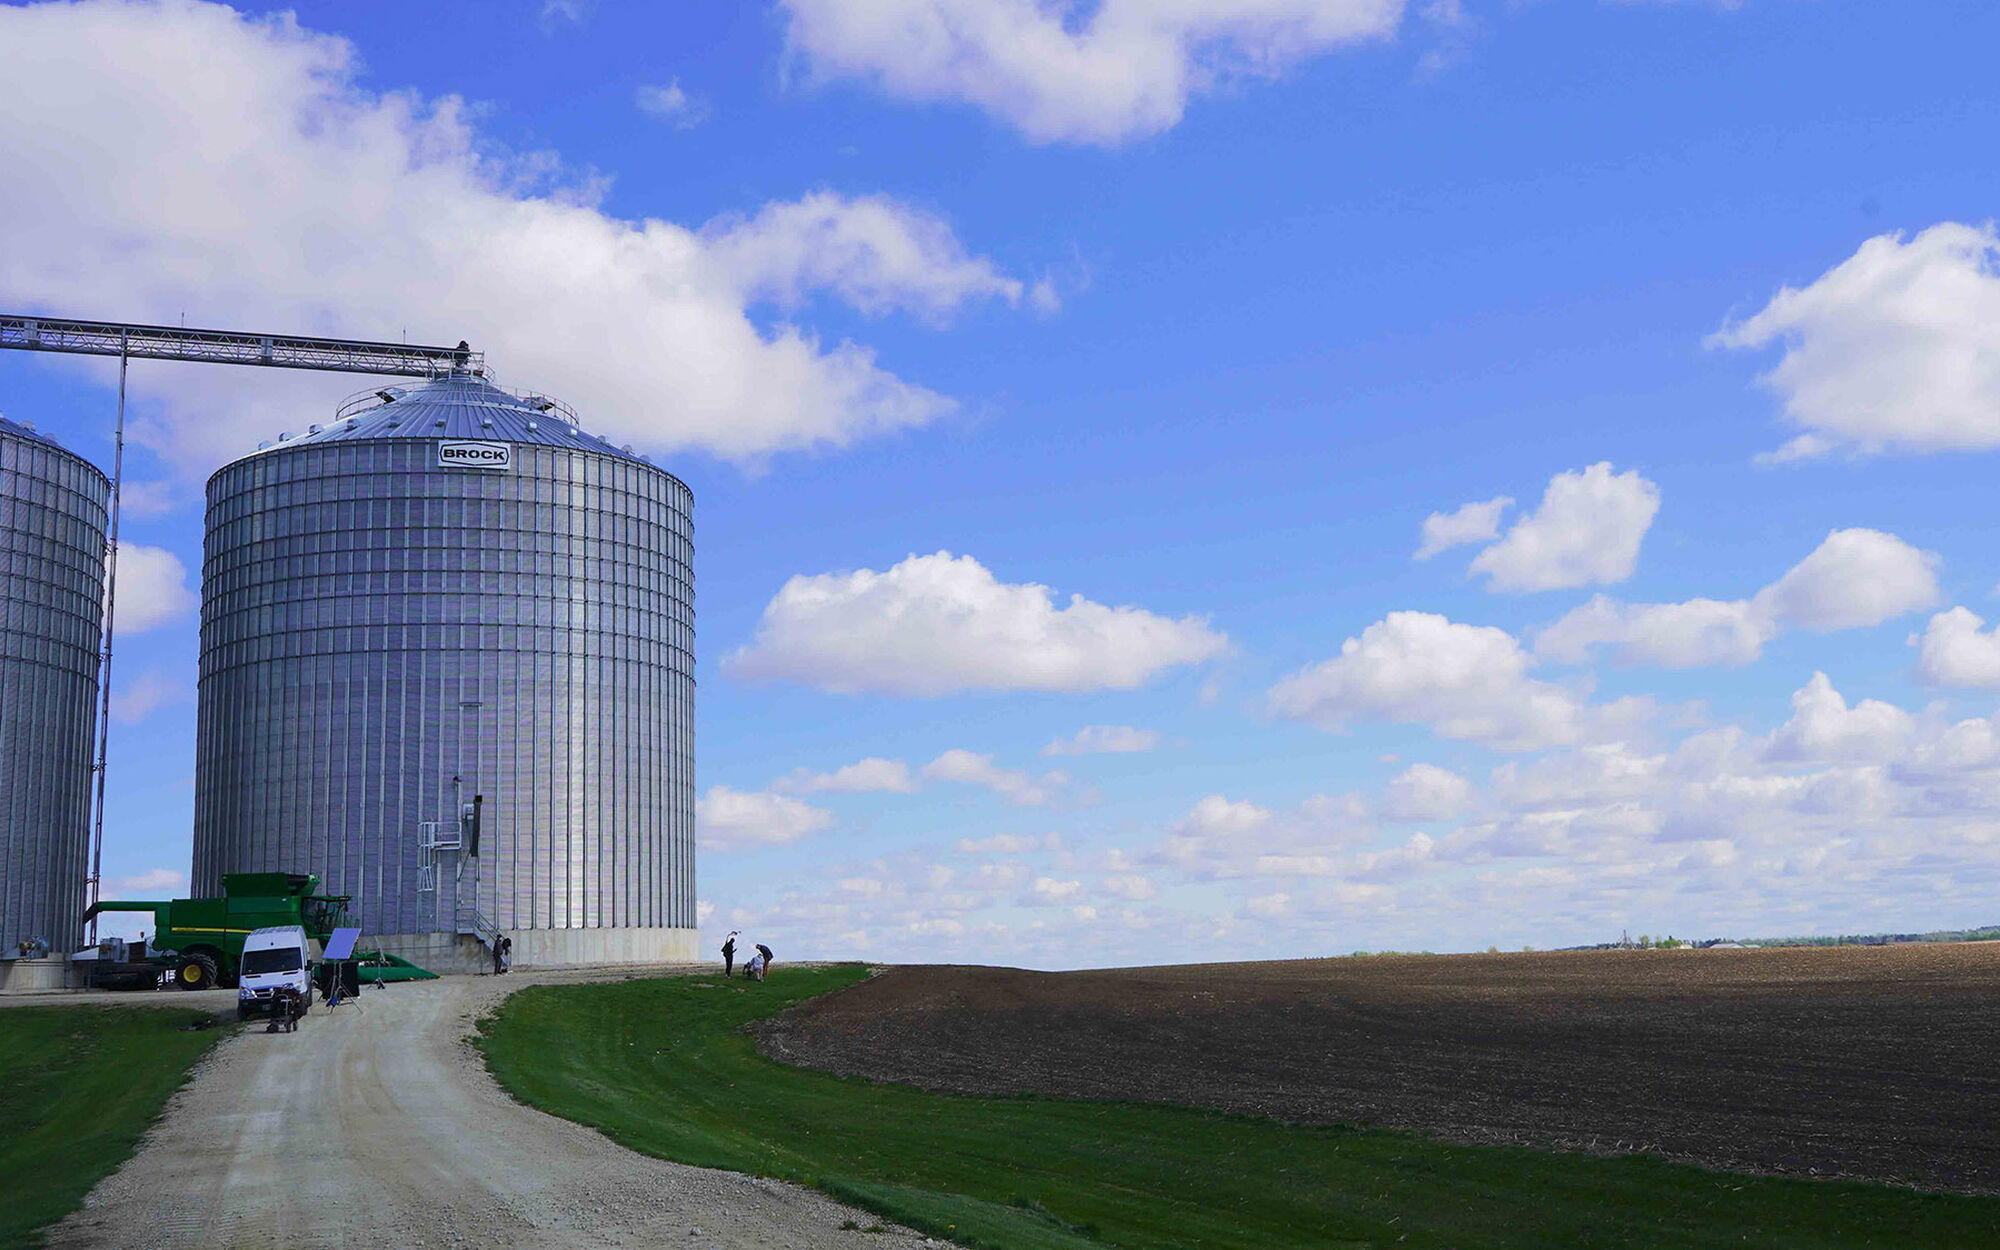 Two grain bins on a Minnesota farm